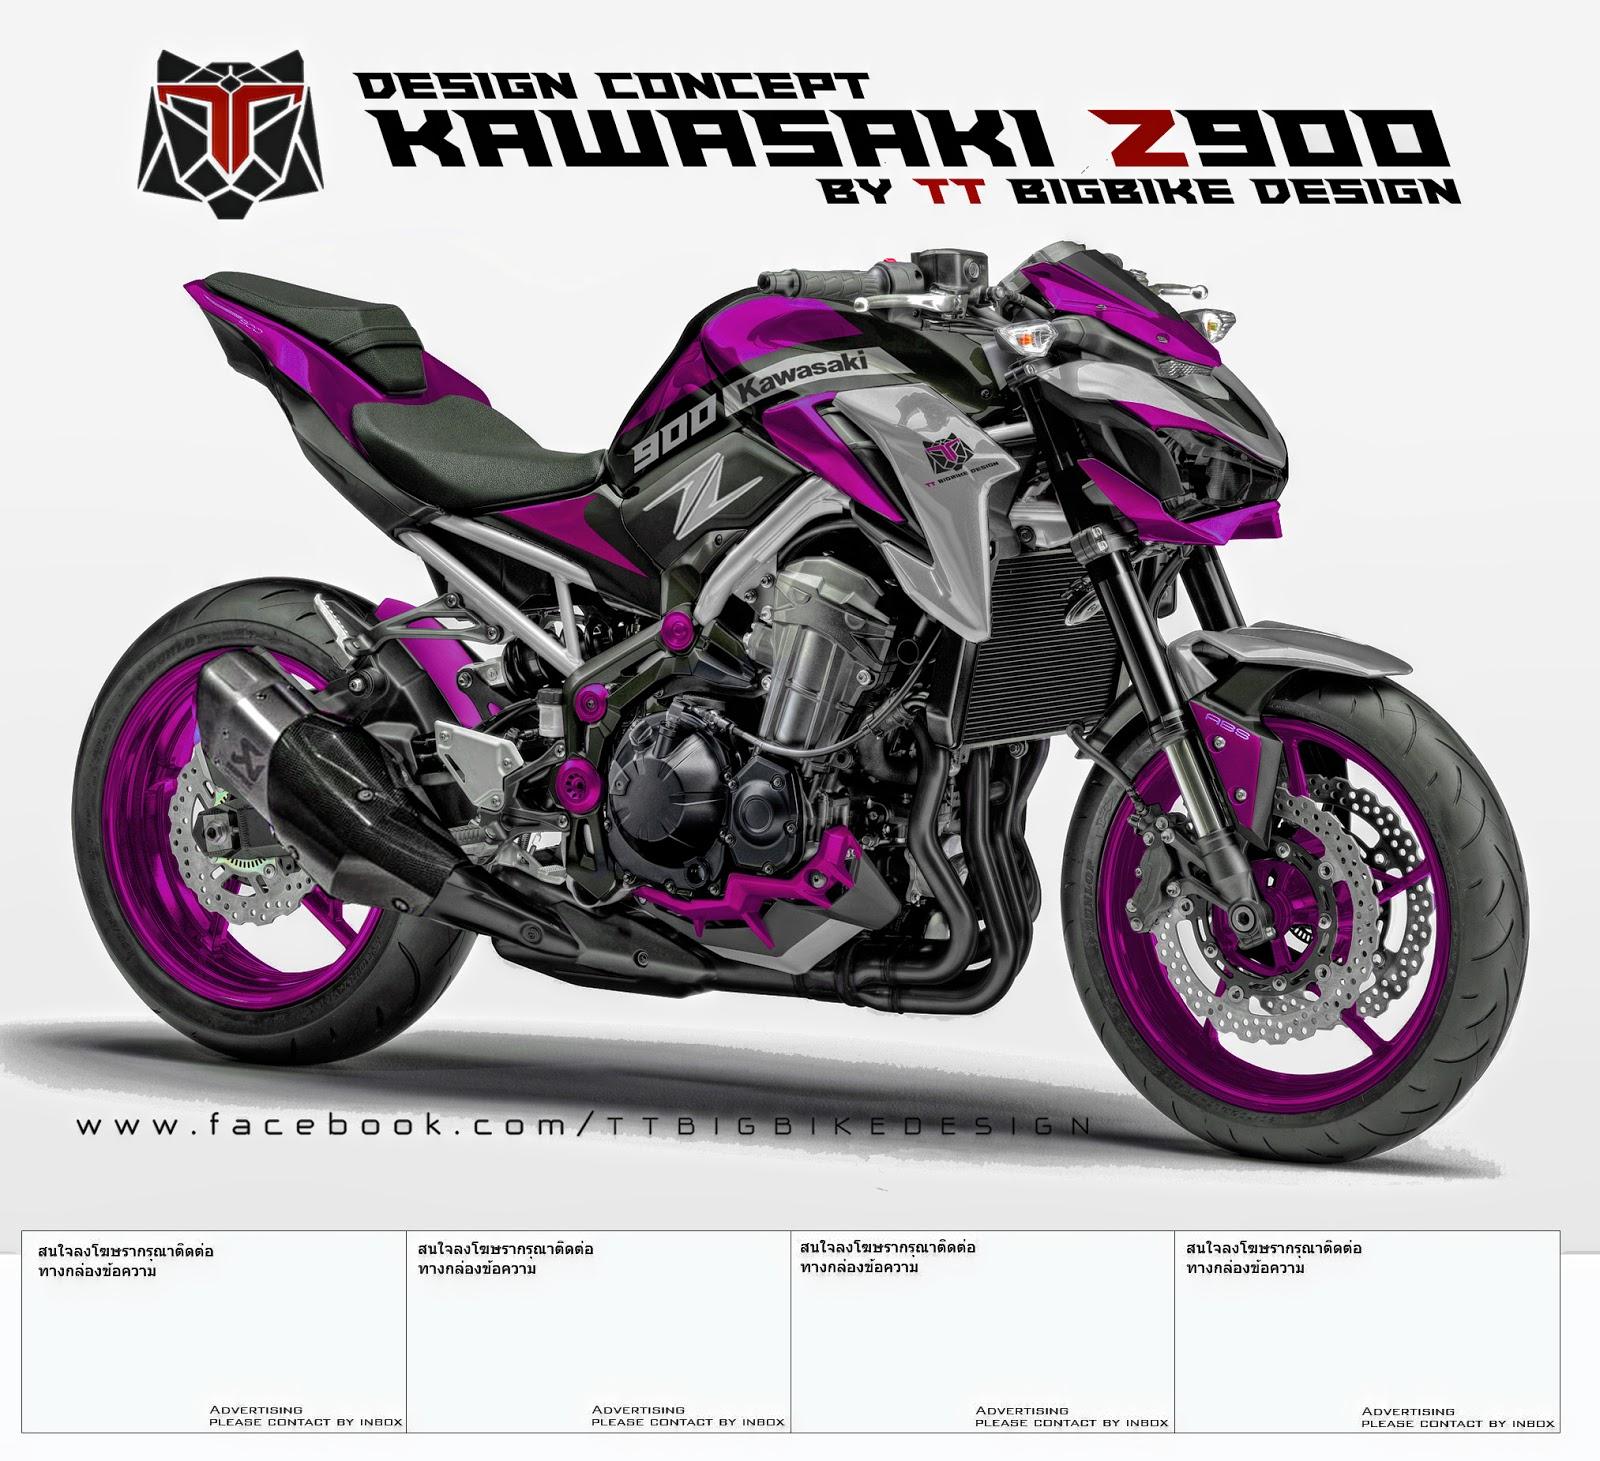 Tt Bigbike Design Kawasaki Z900 Design Concept 1